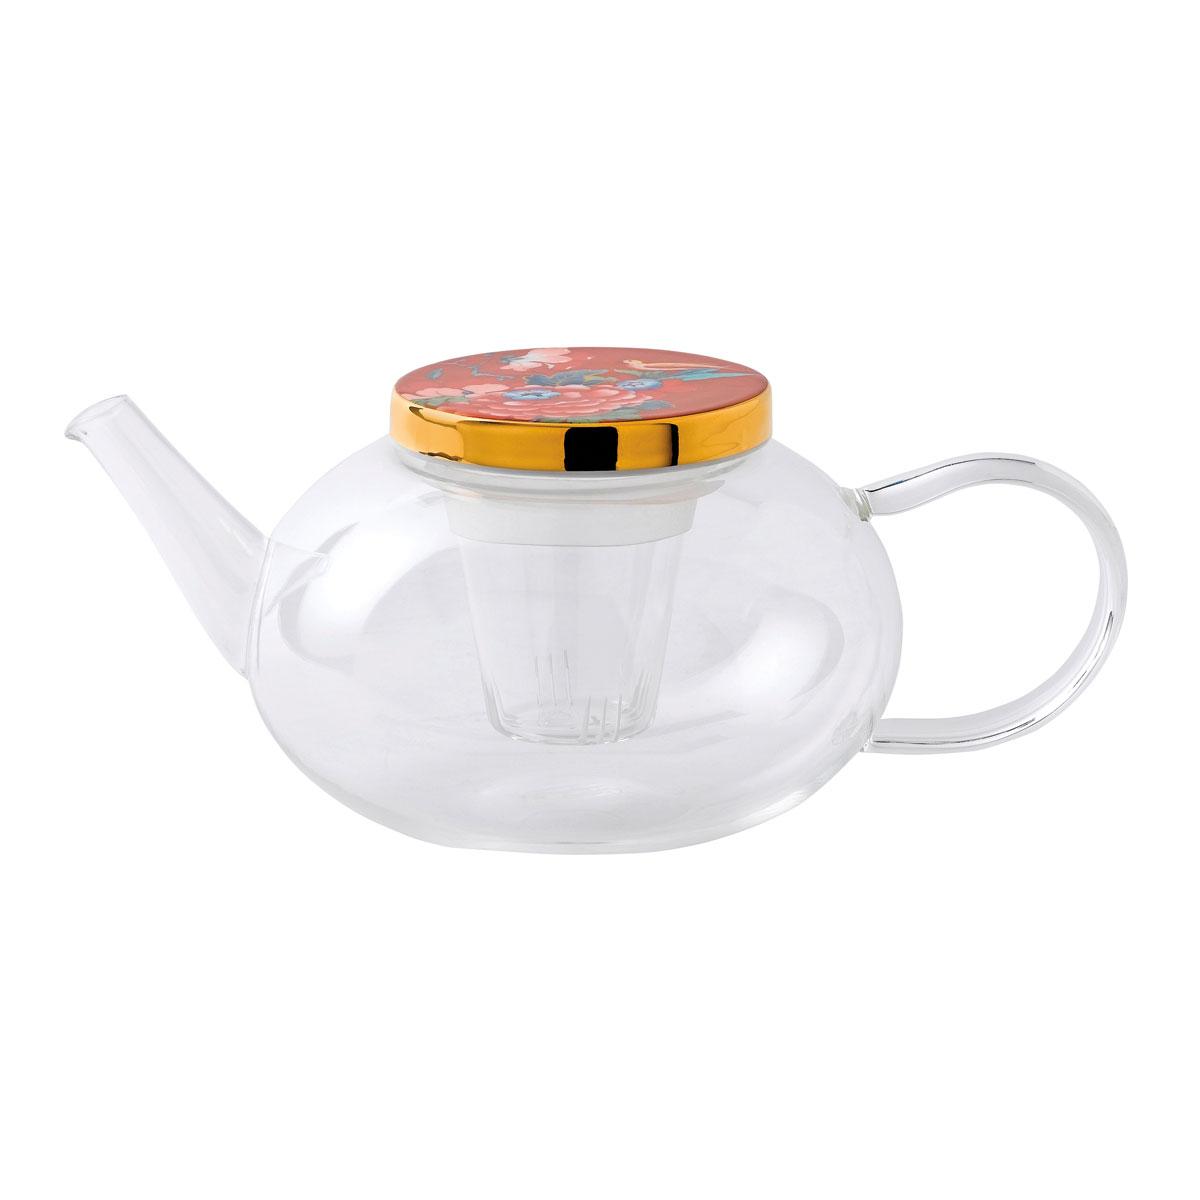 Wedgwood China Paeonia Blush Teapot Glass, With Ceramic Lid